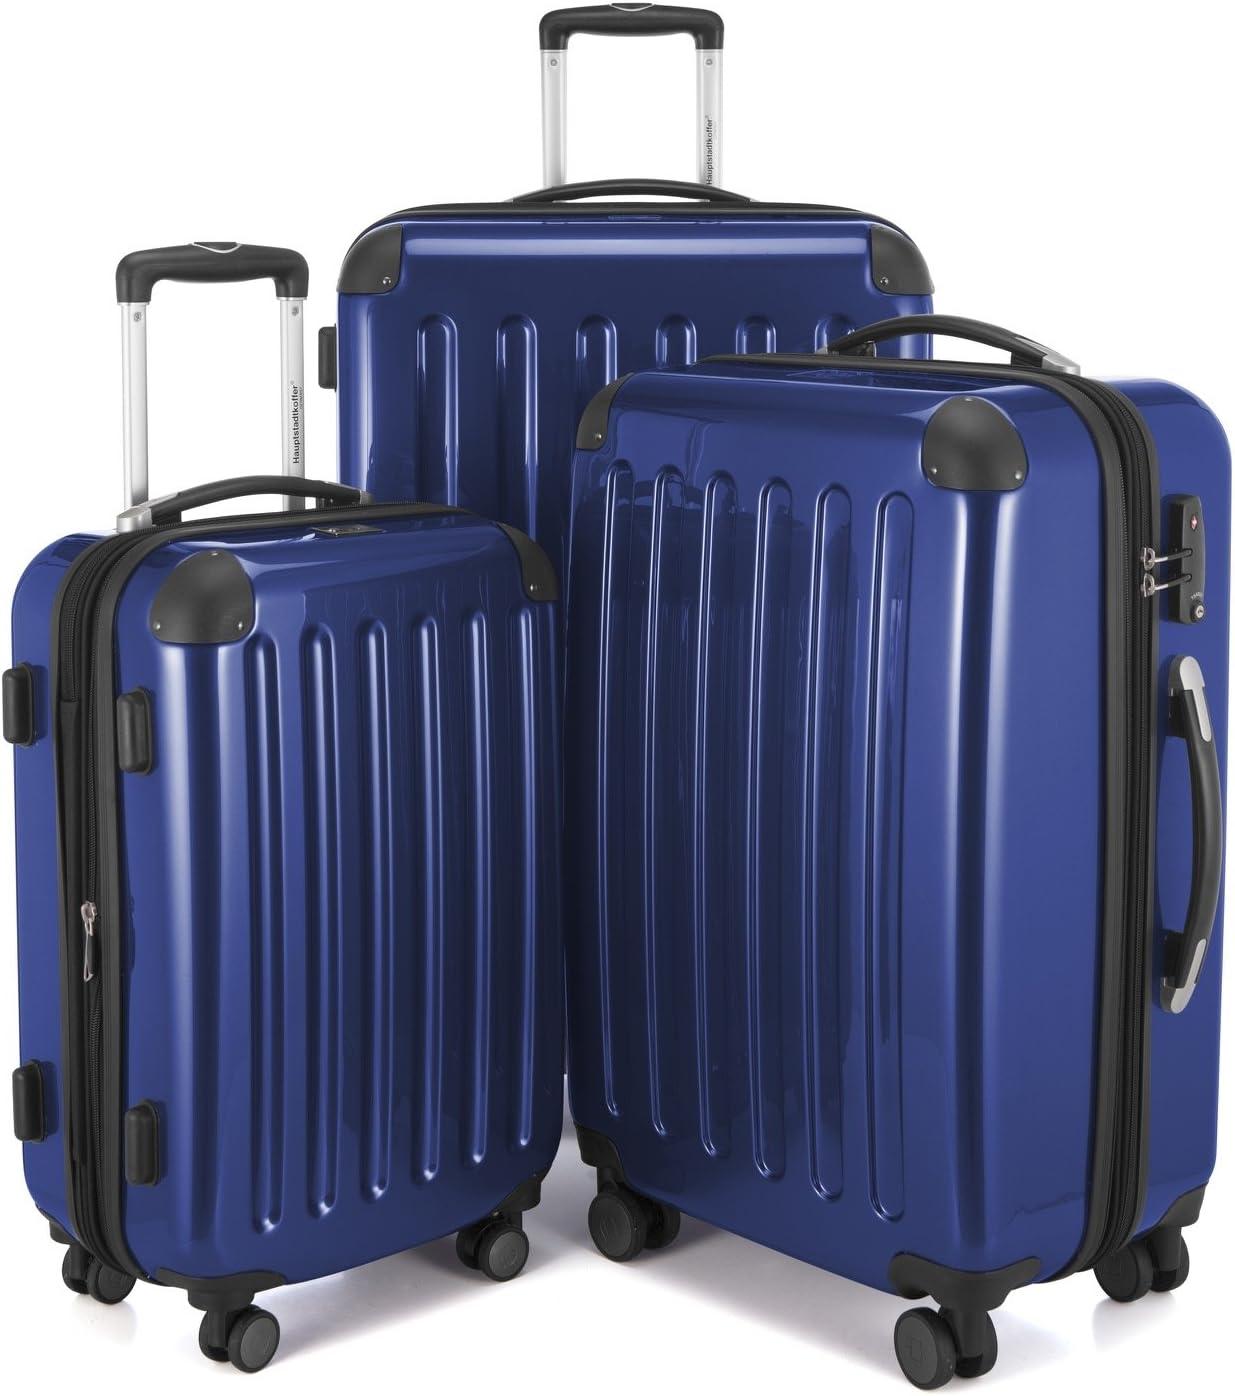 Hauptstadtkoffer Luggage Set, Dark Blue, set of 3